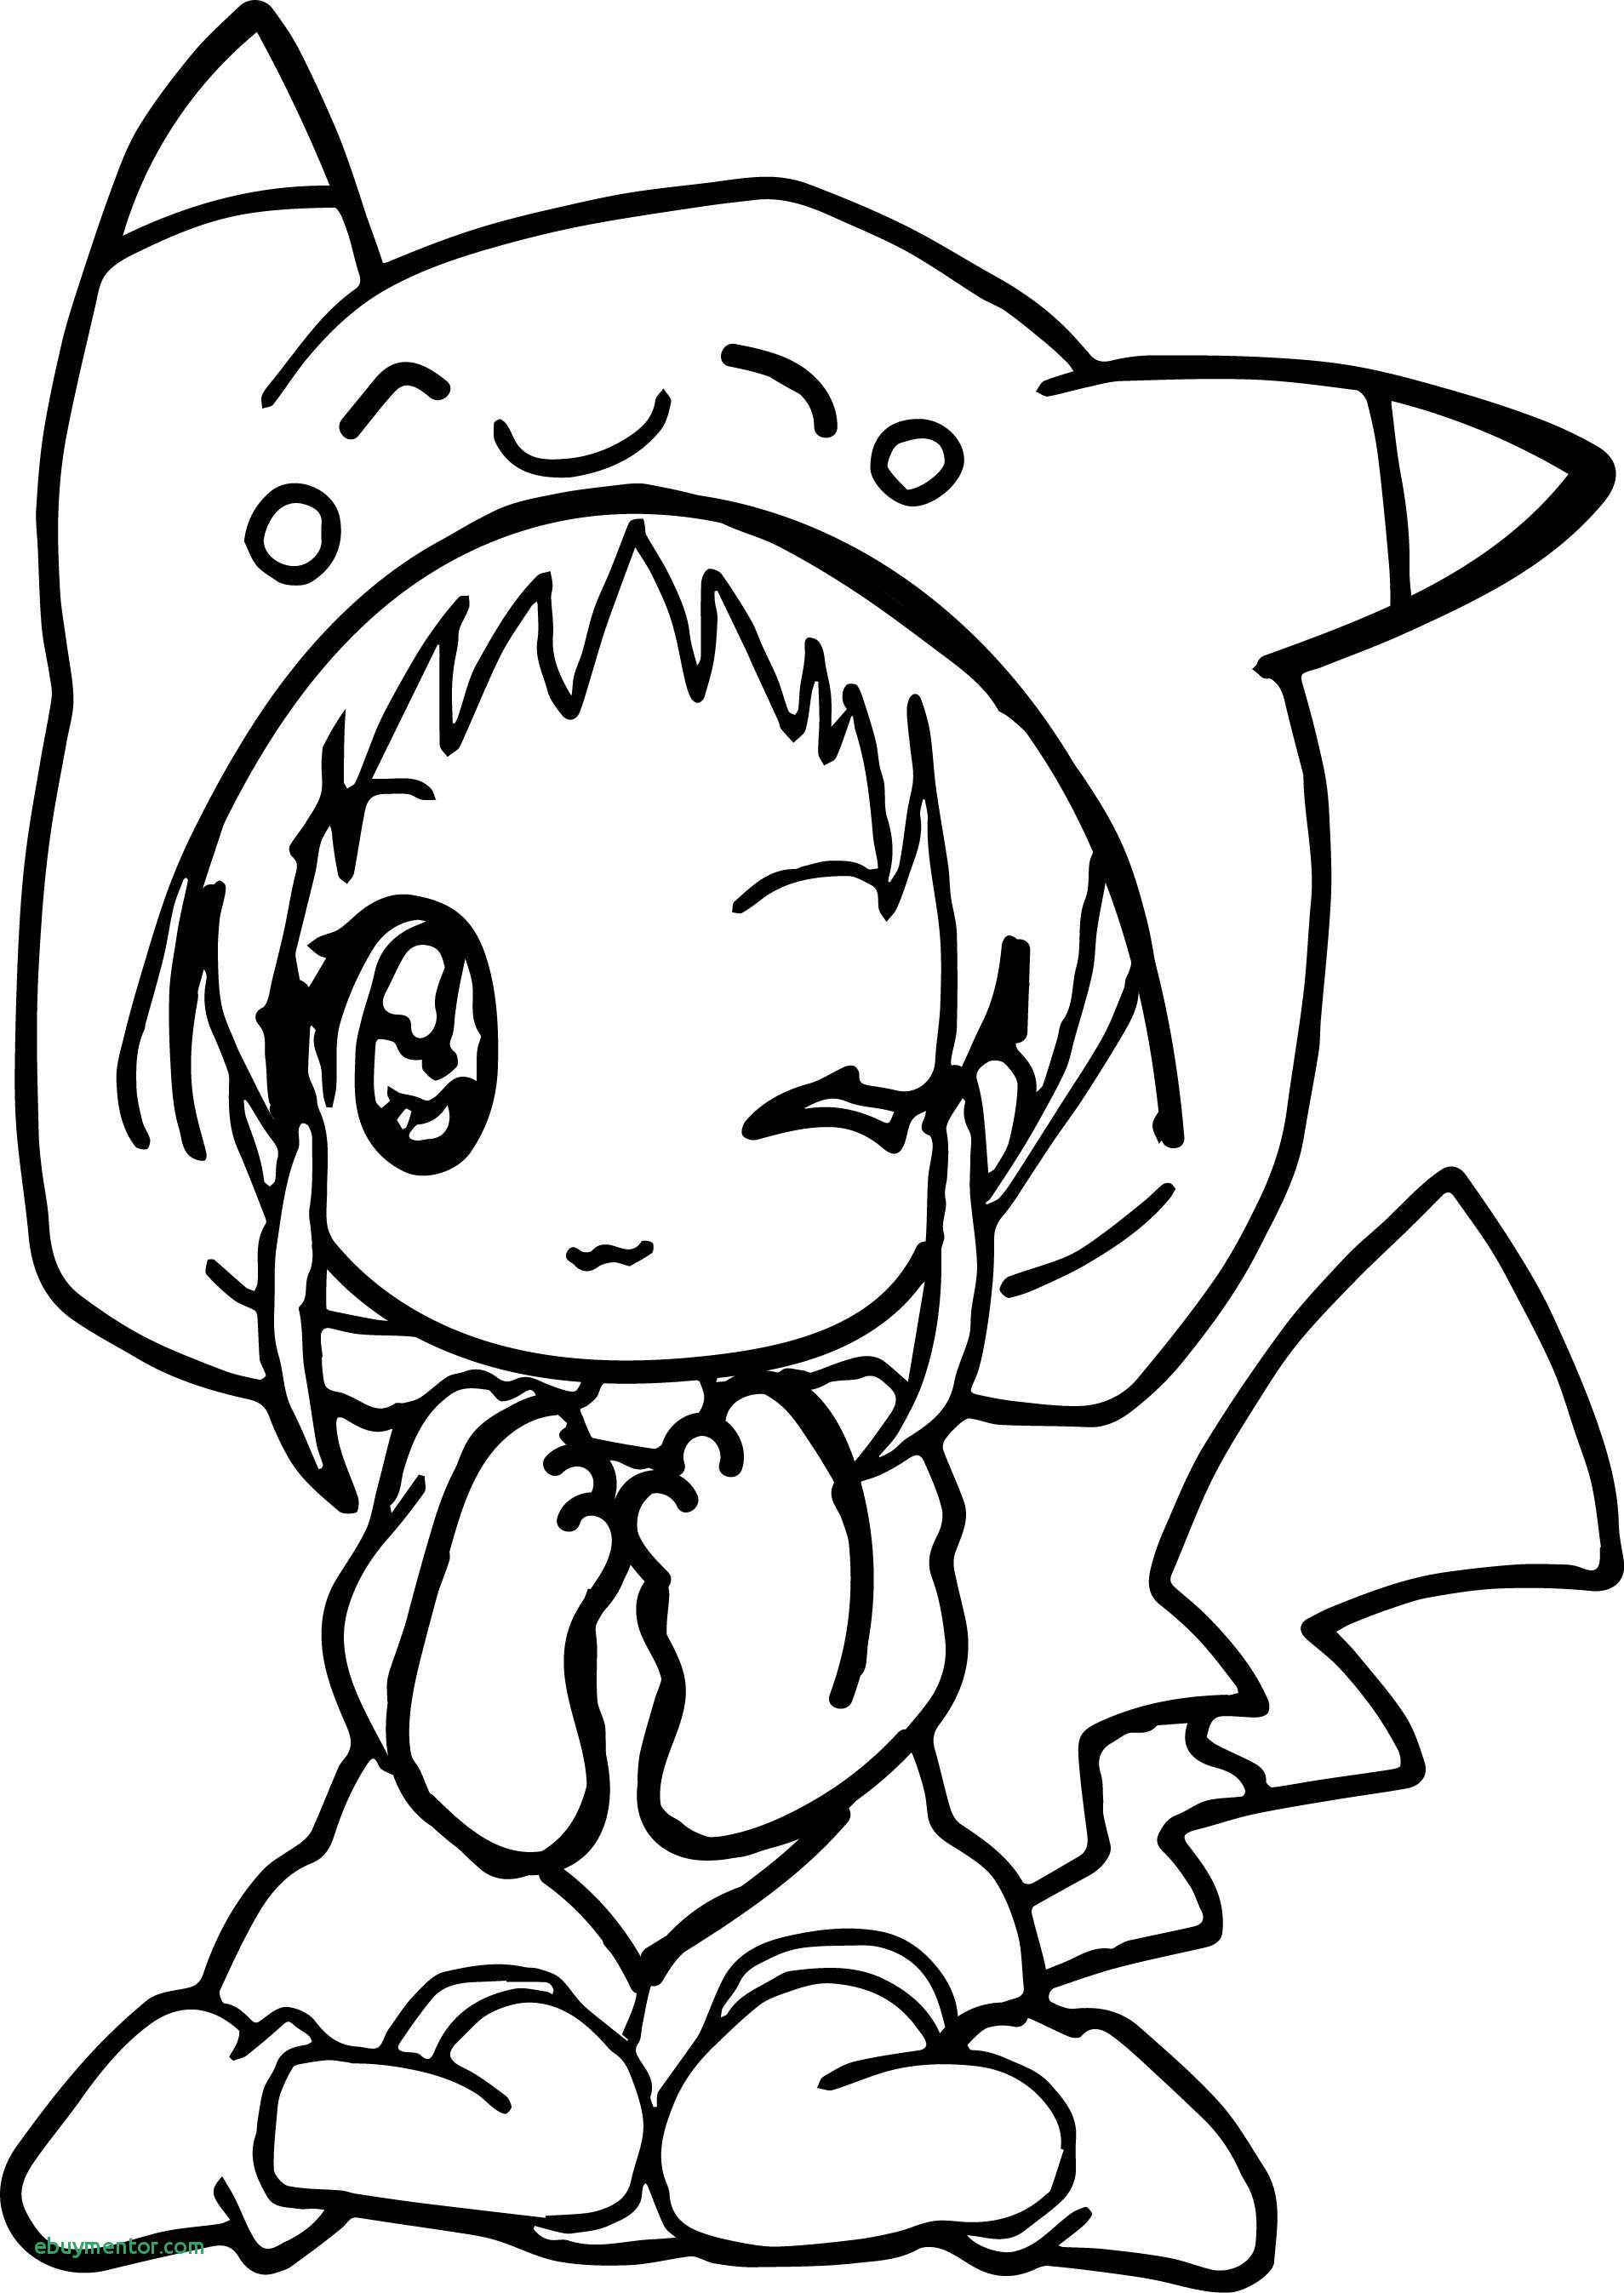 Anime Ausmalbilder Chibi Frisch Cute Chibi Girl Coloring Pages Download Cute Anime Chibi Girl Schön Bilder